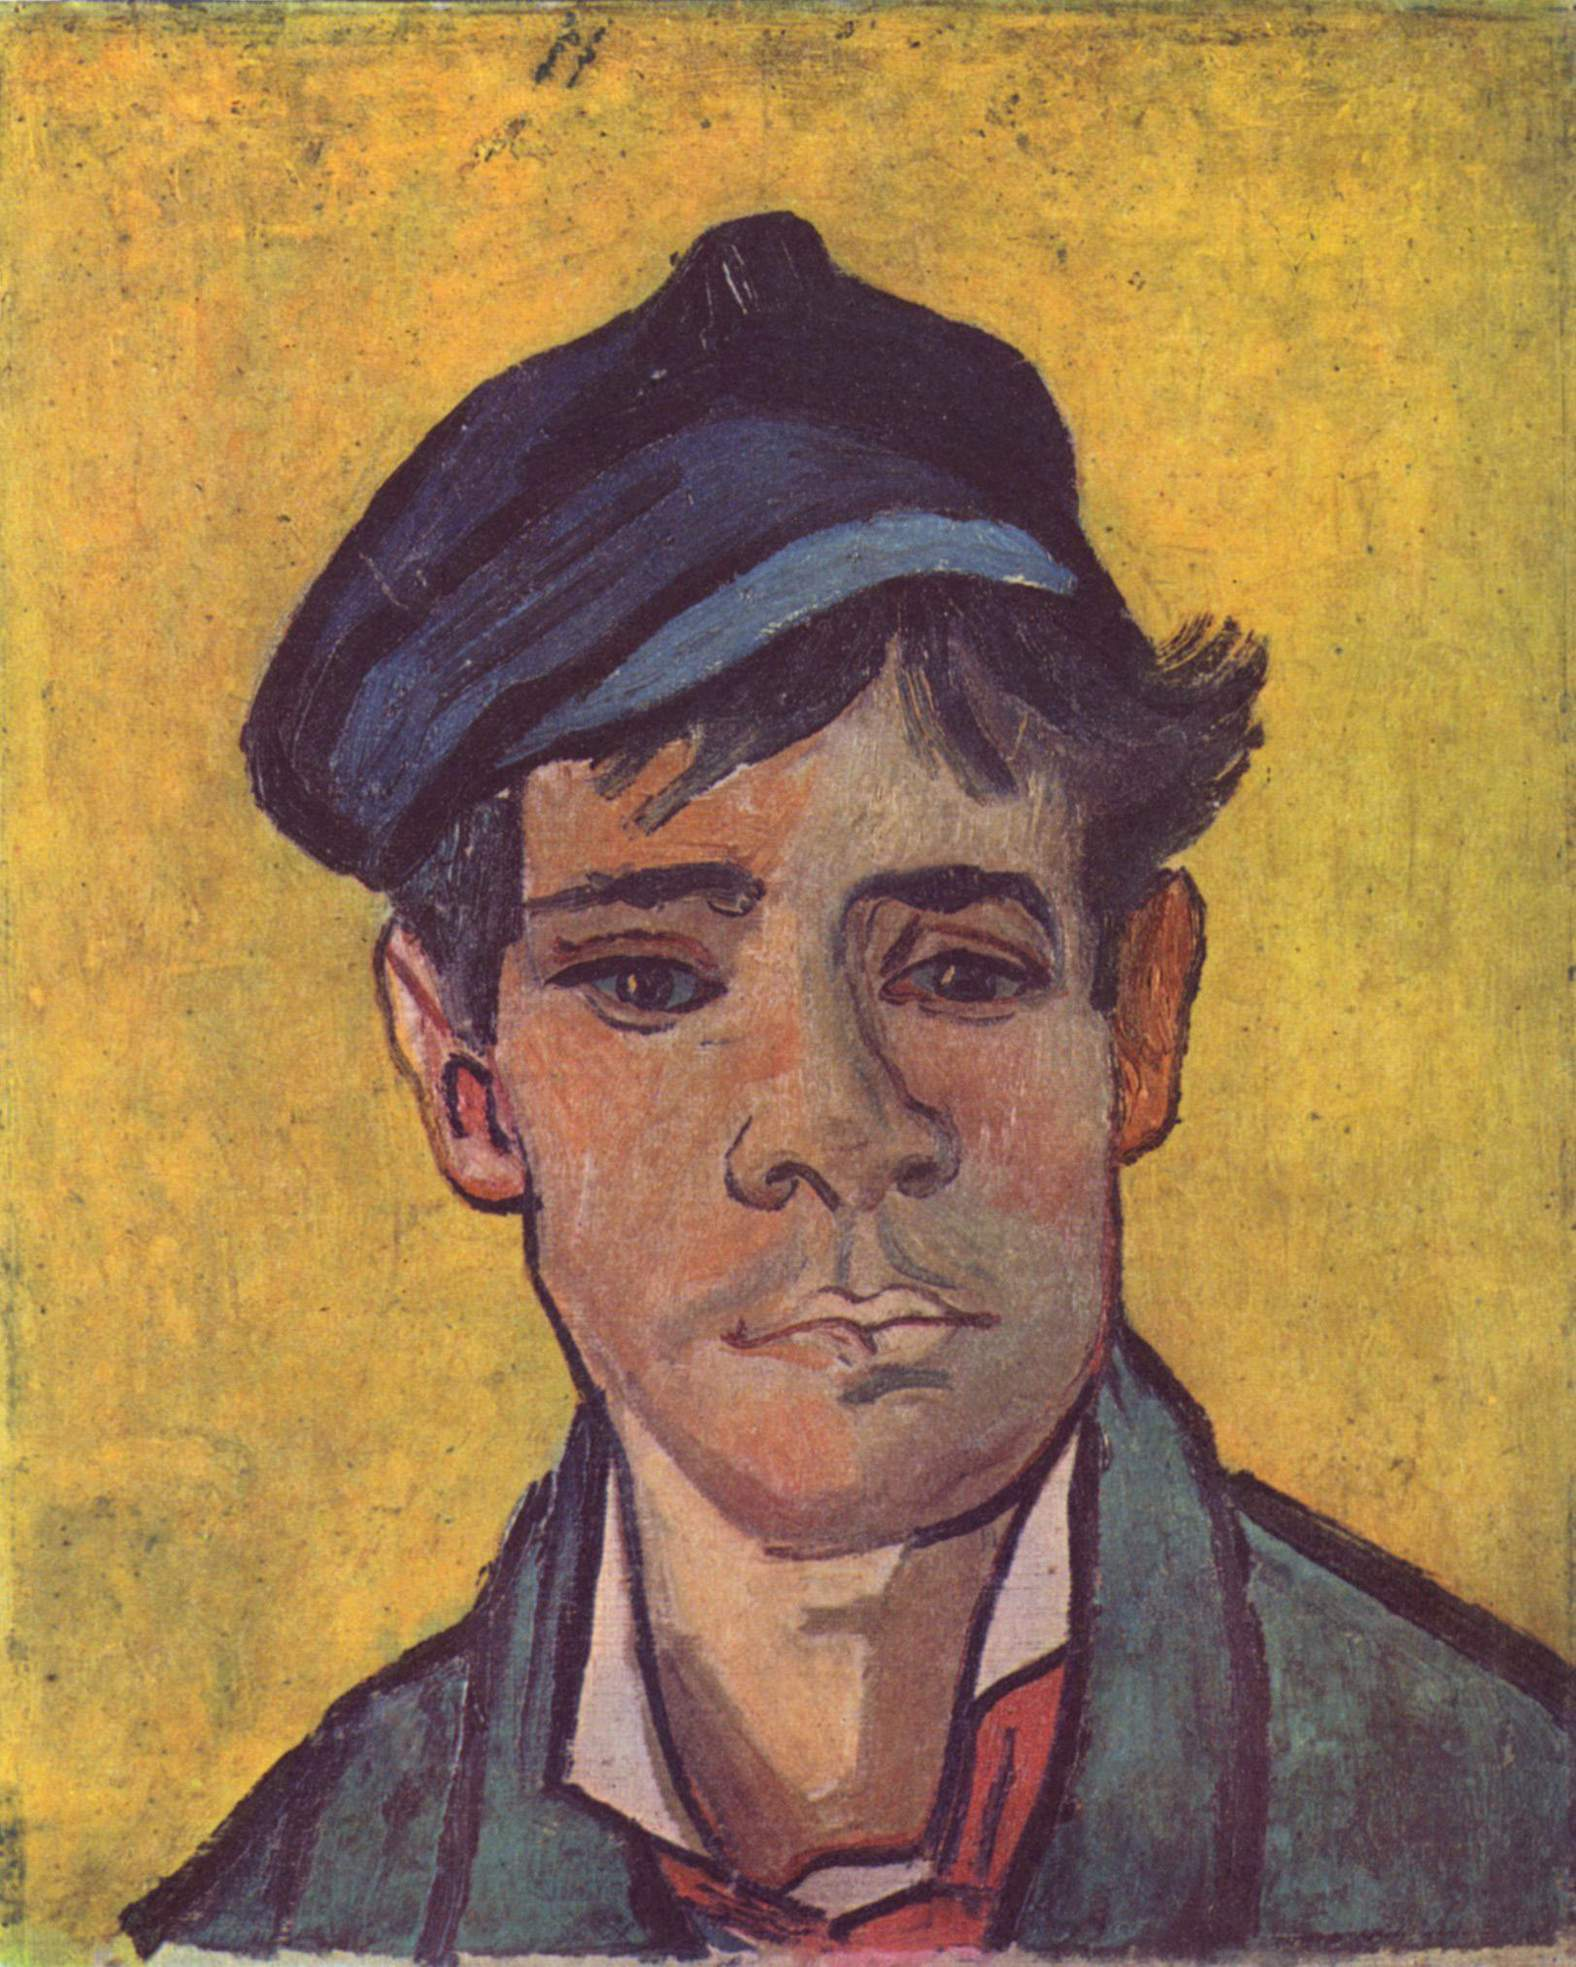 Vincent_Willem_van_Gogh_055.jpg